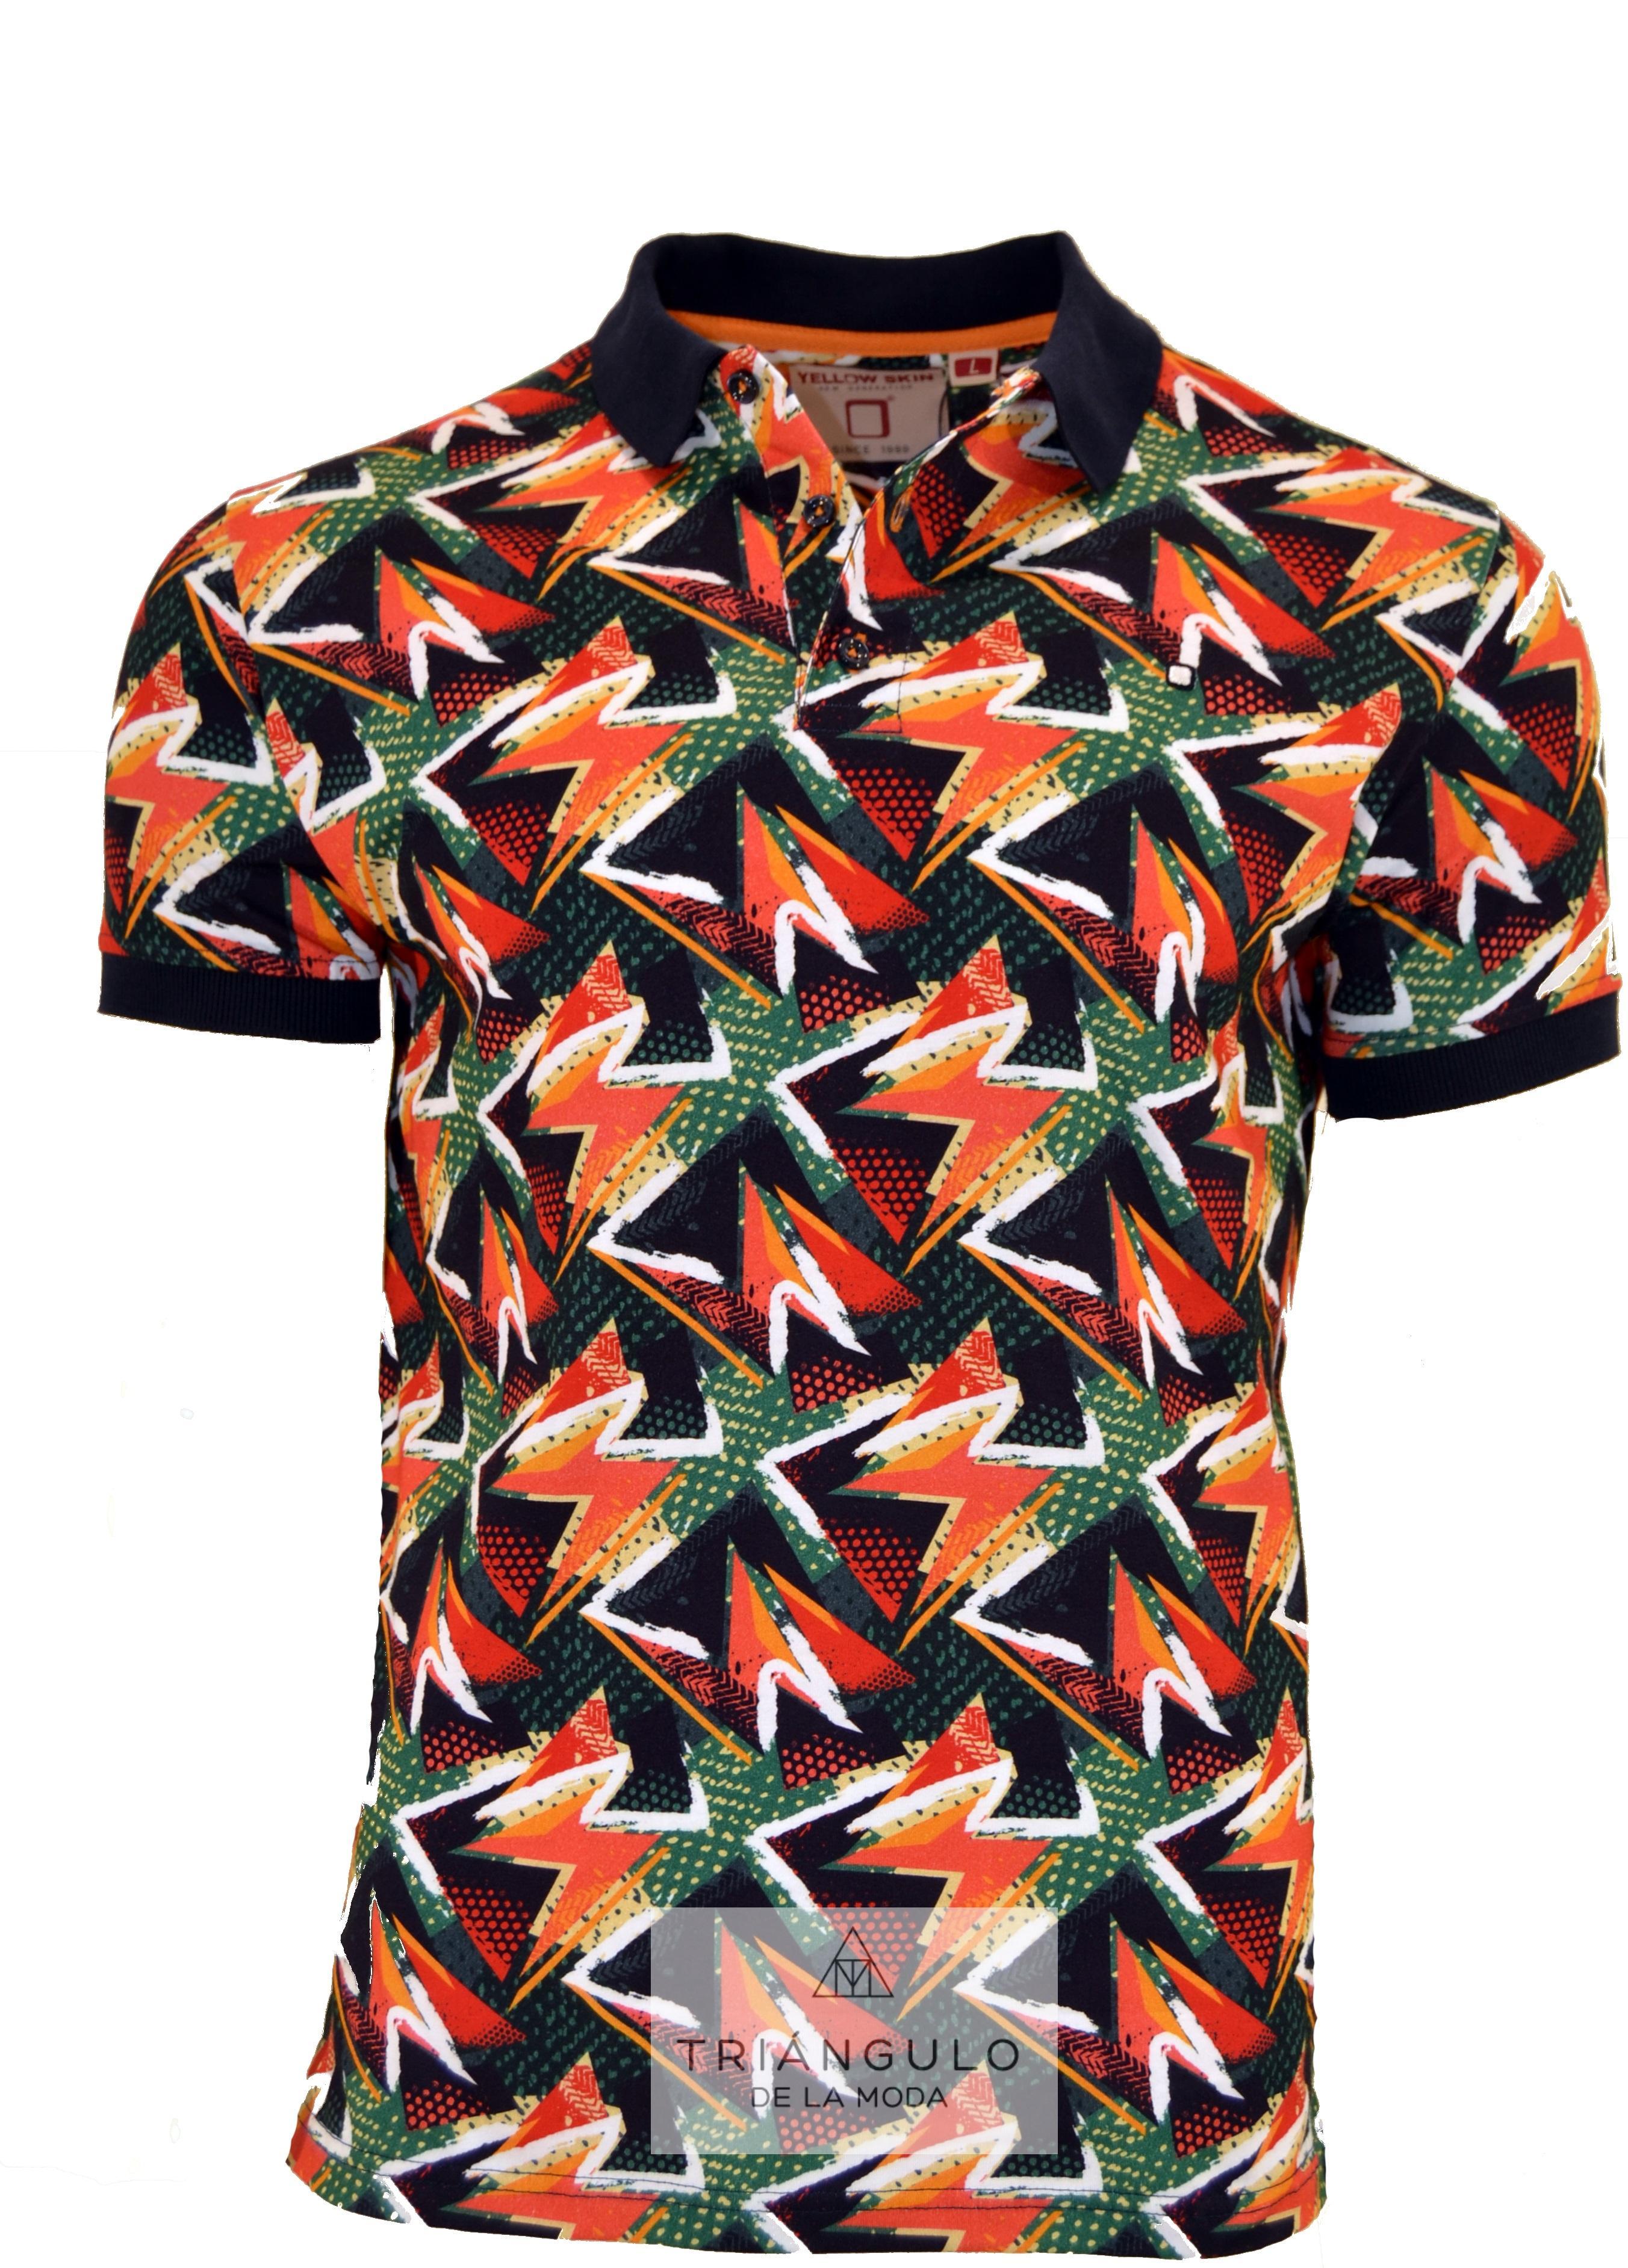 Tienda online del Triangulo de la Moda POLO